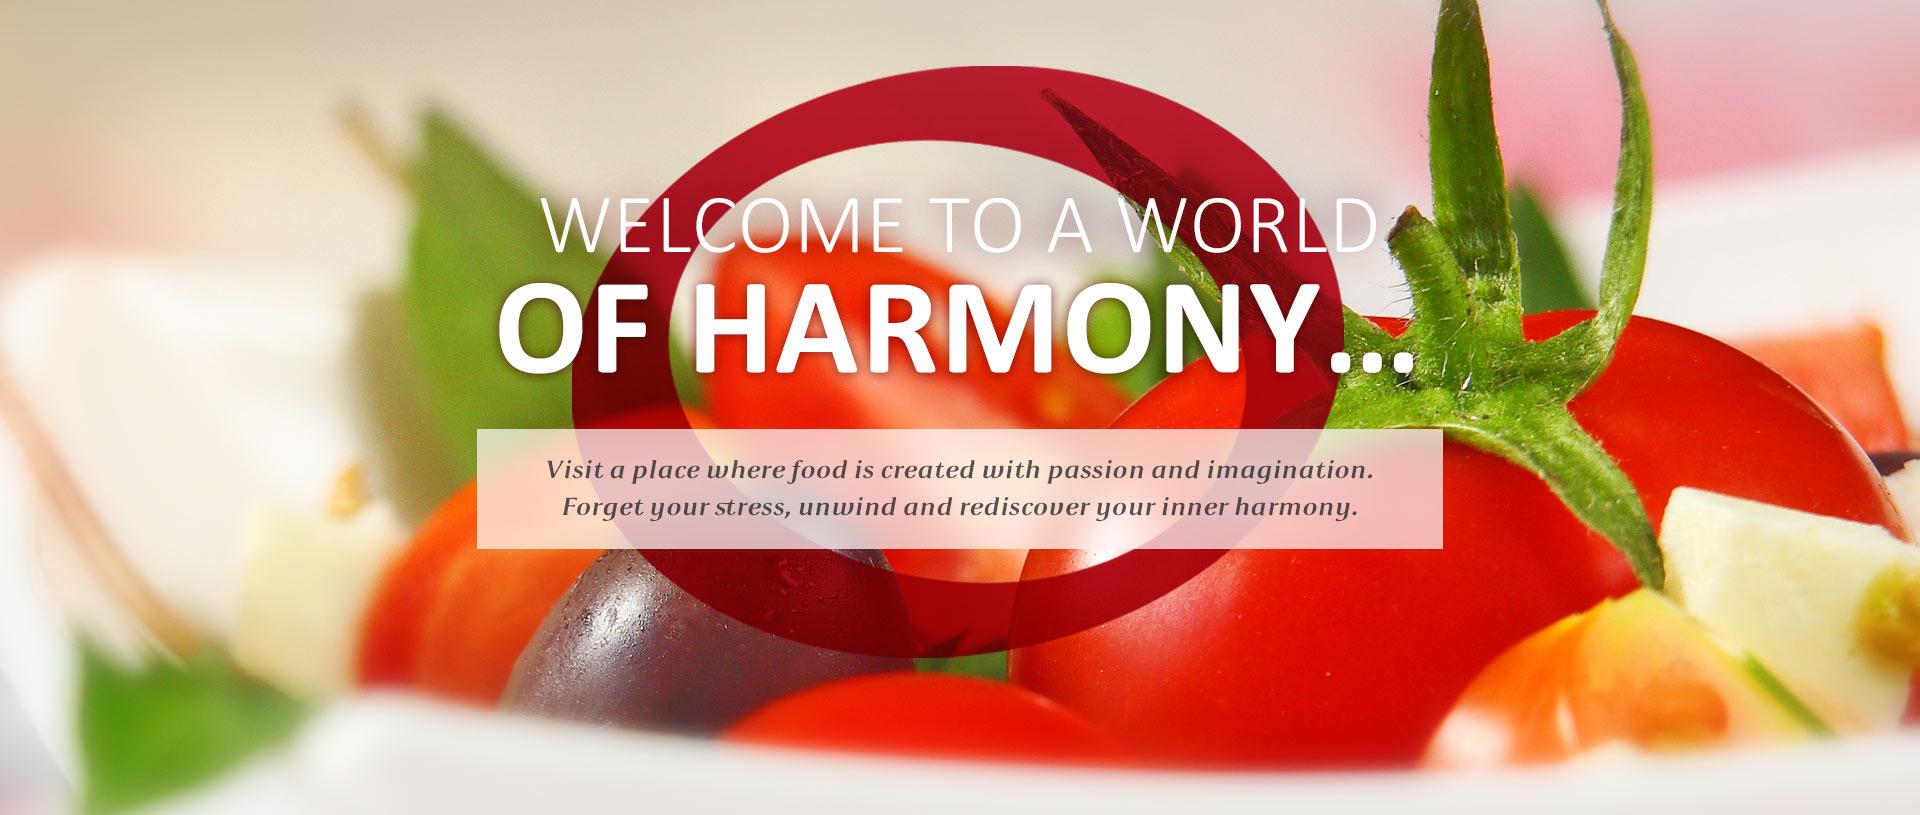 Harmony Restaurant - First slider image